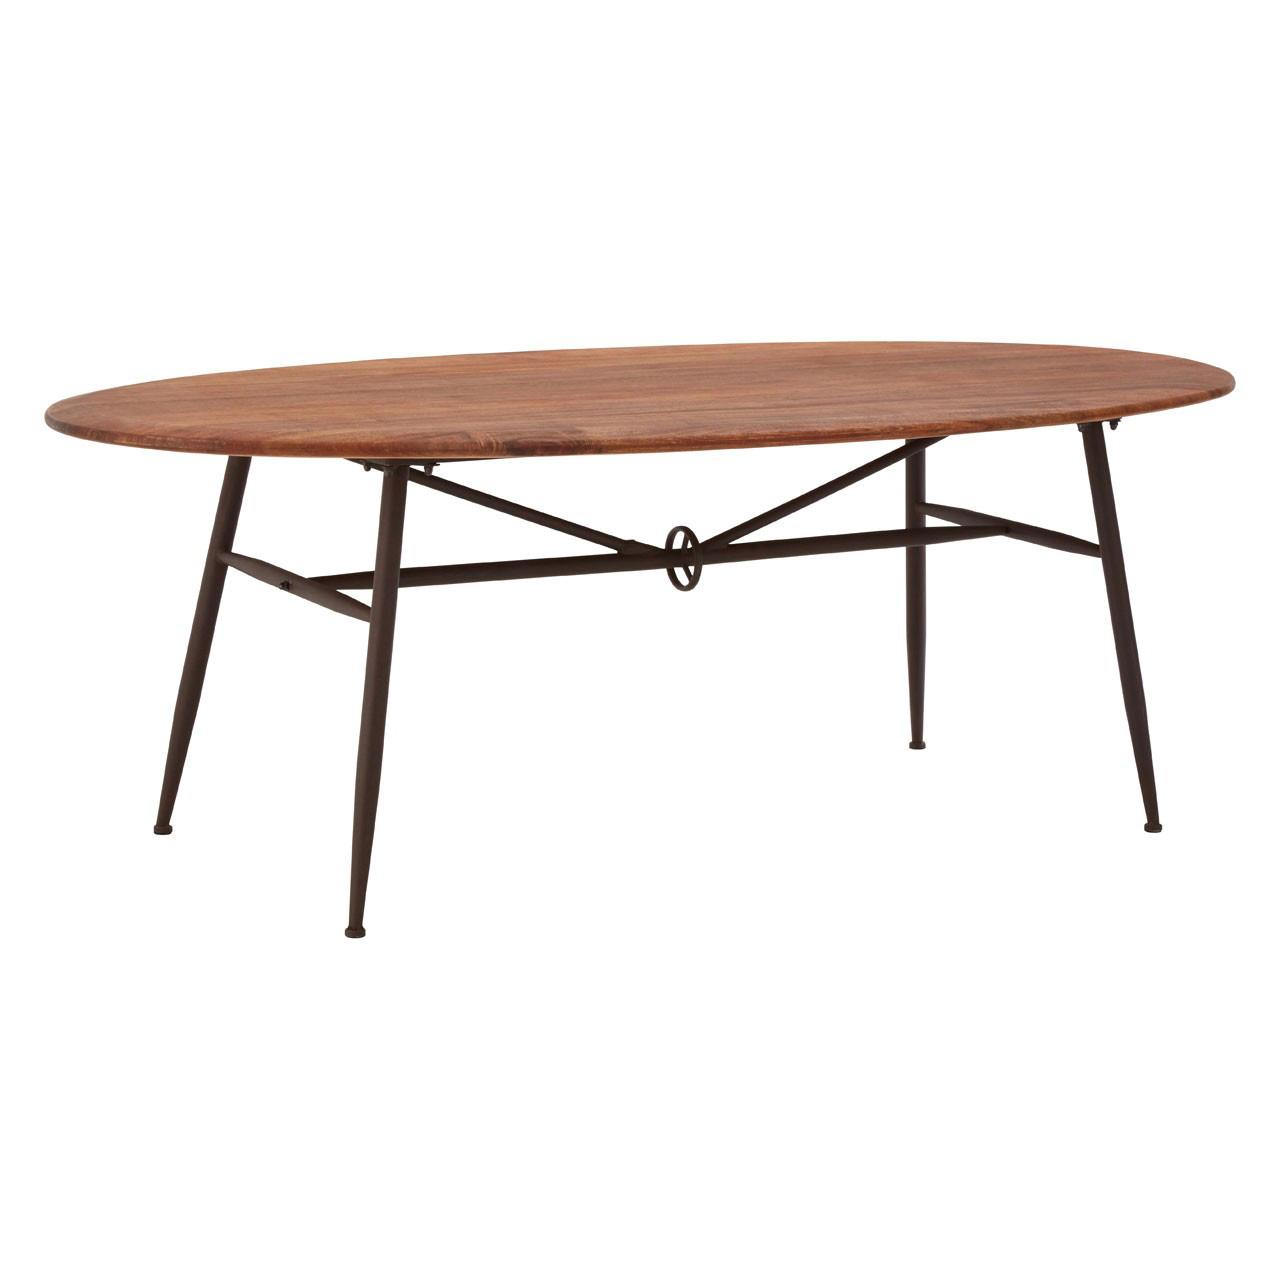 Foundry Oval Walnut Dining Table  Industrial  FADScouk